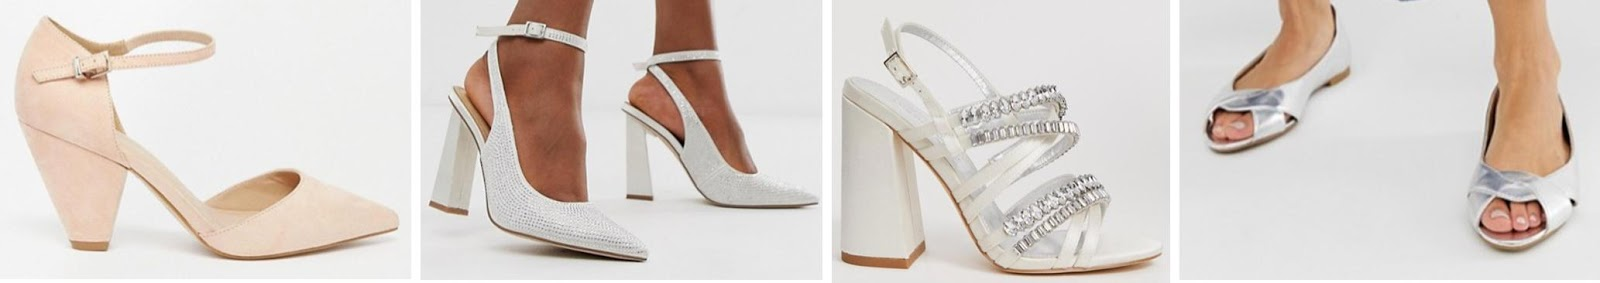 budget wedding shoes